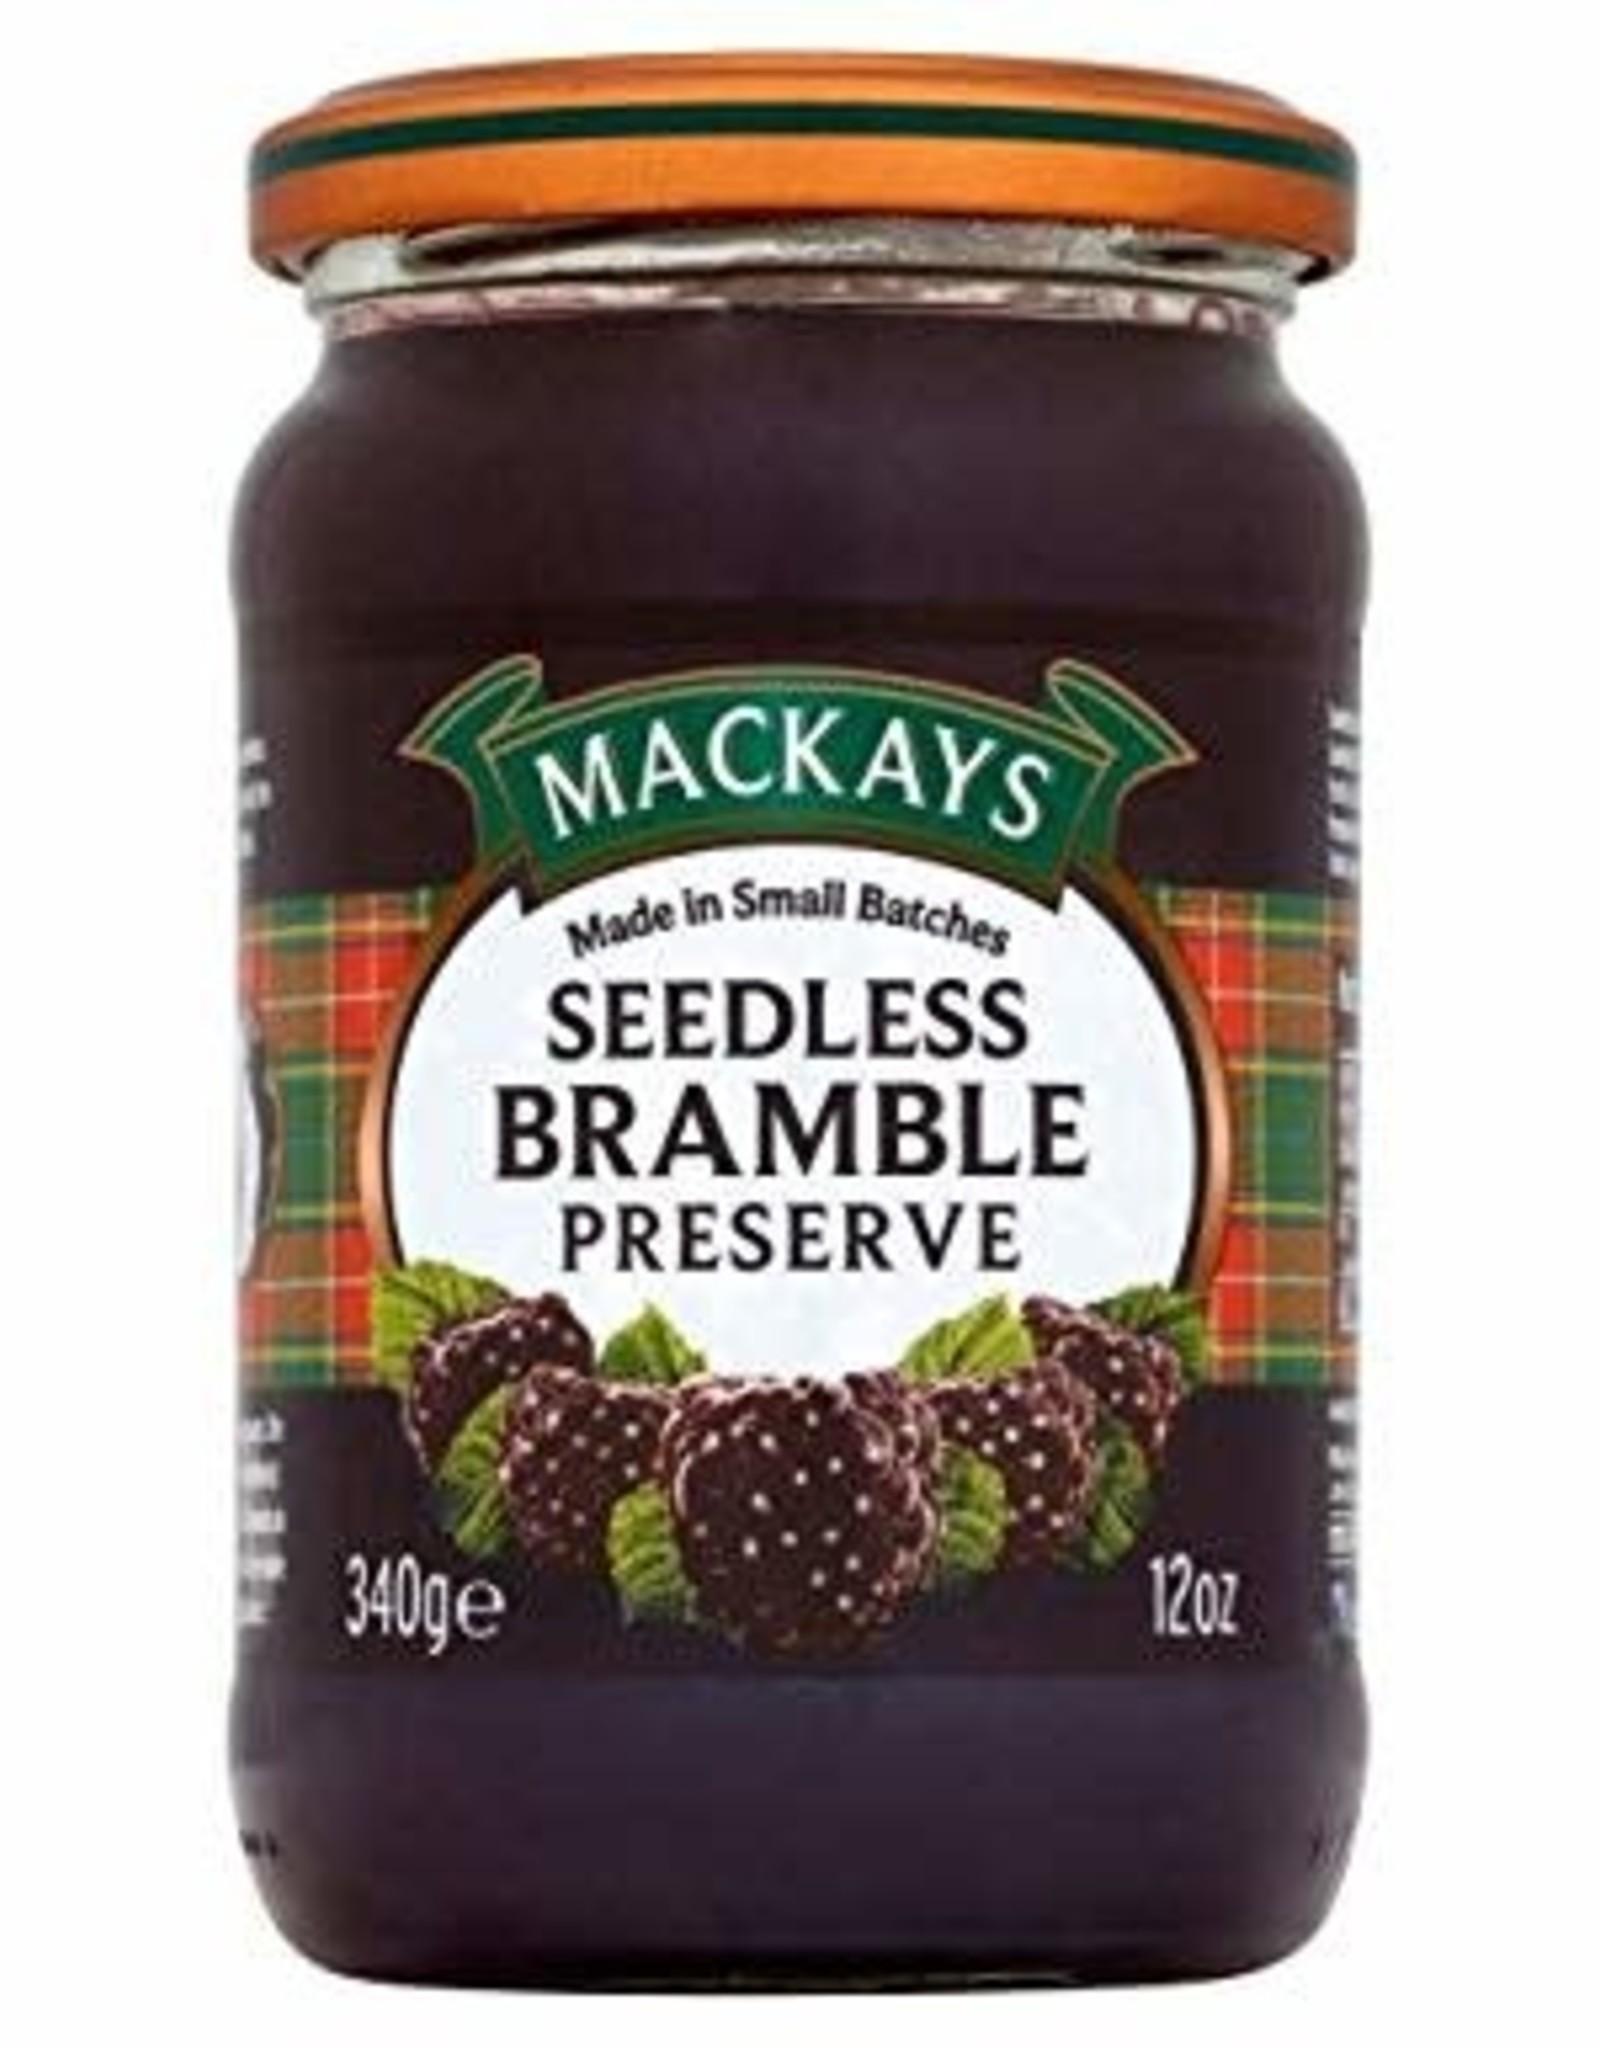 Mackays Mackay's Seedless Brambles Preserve